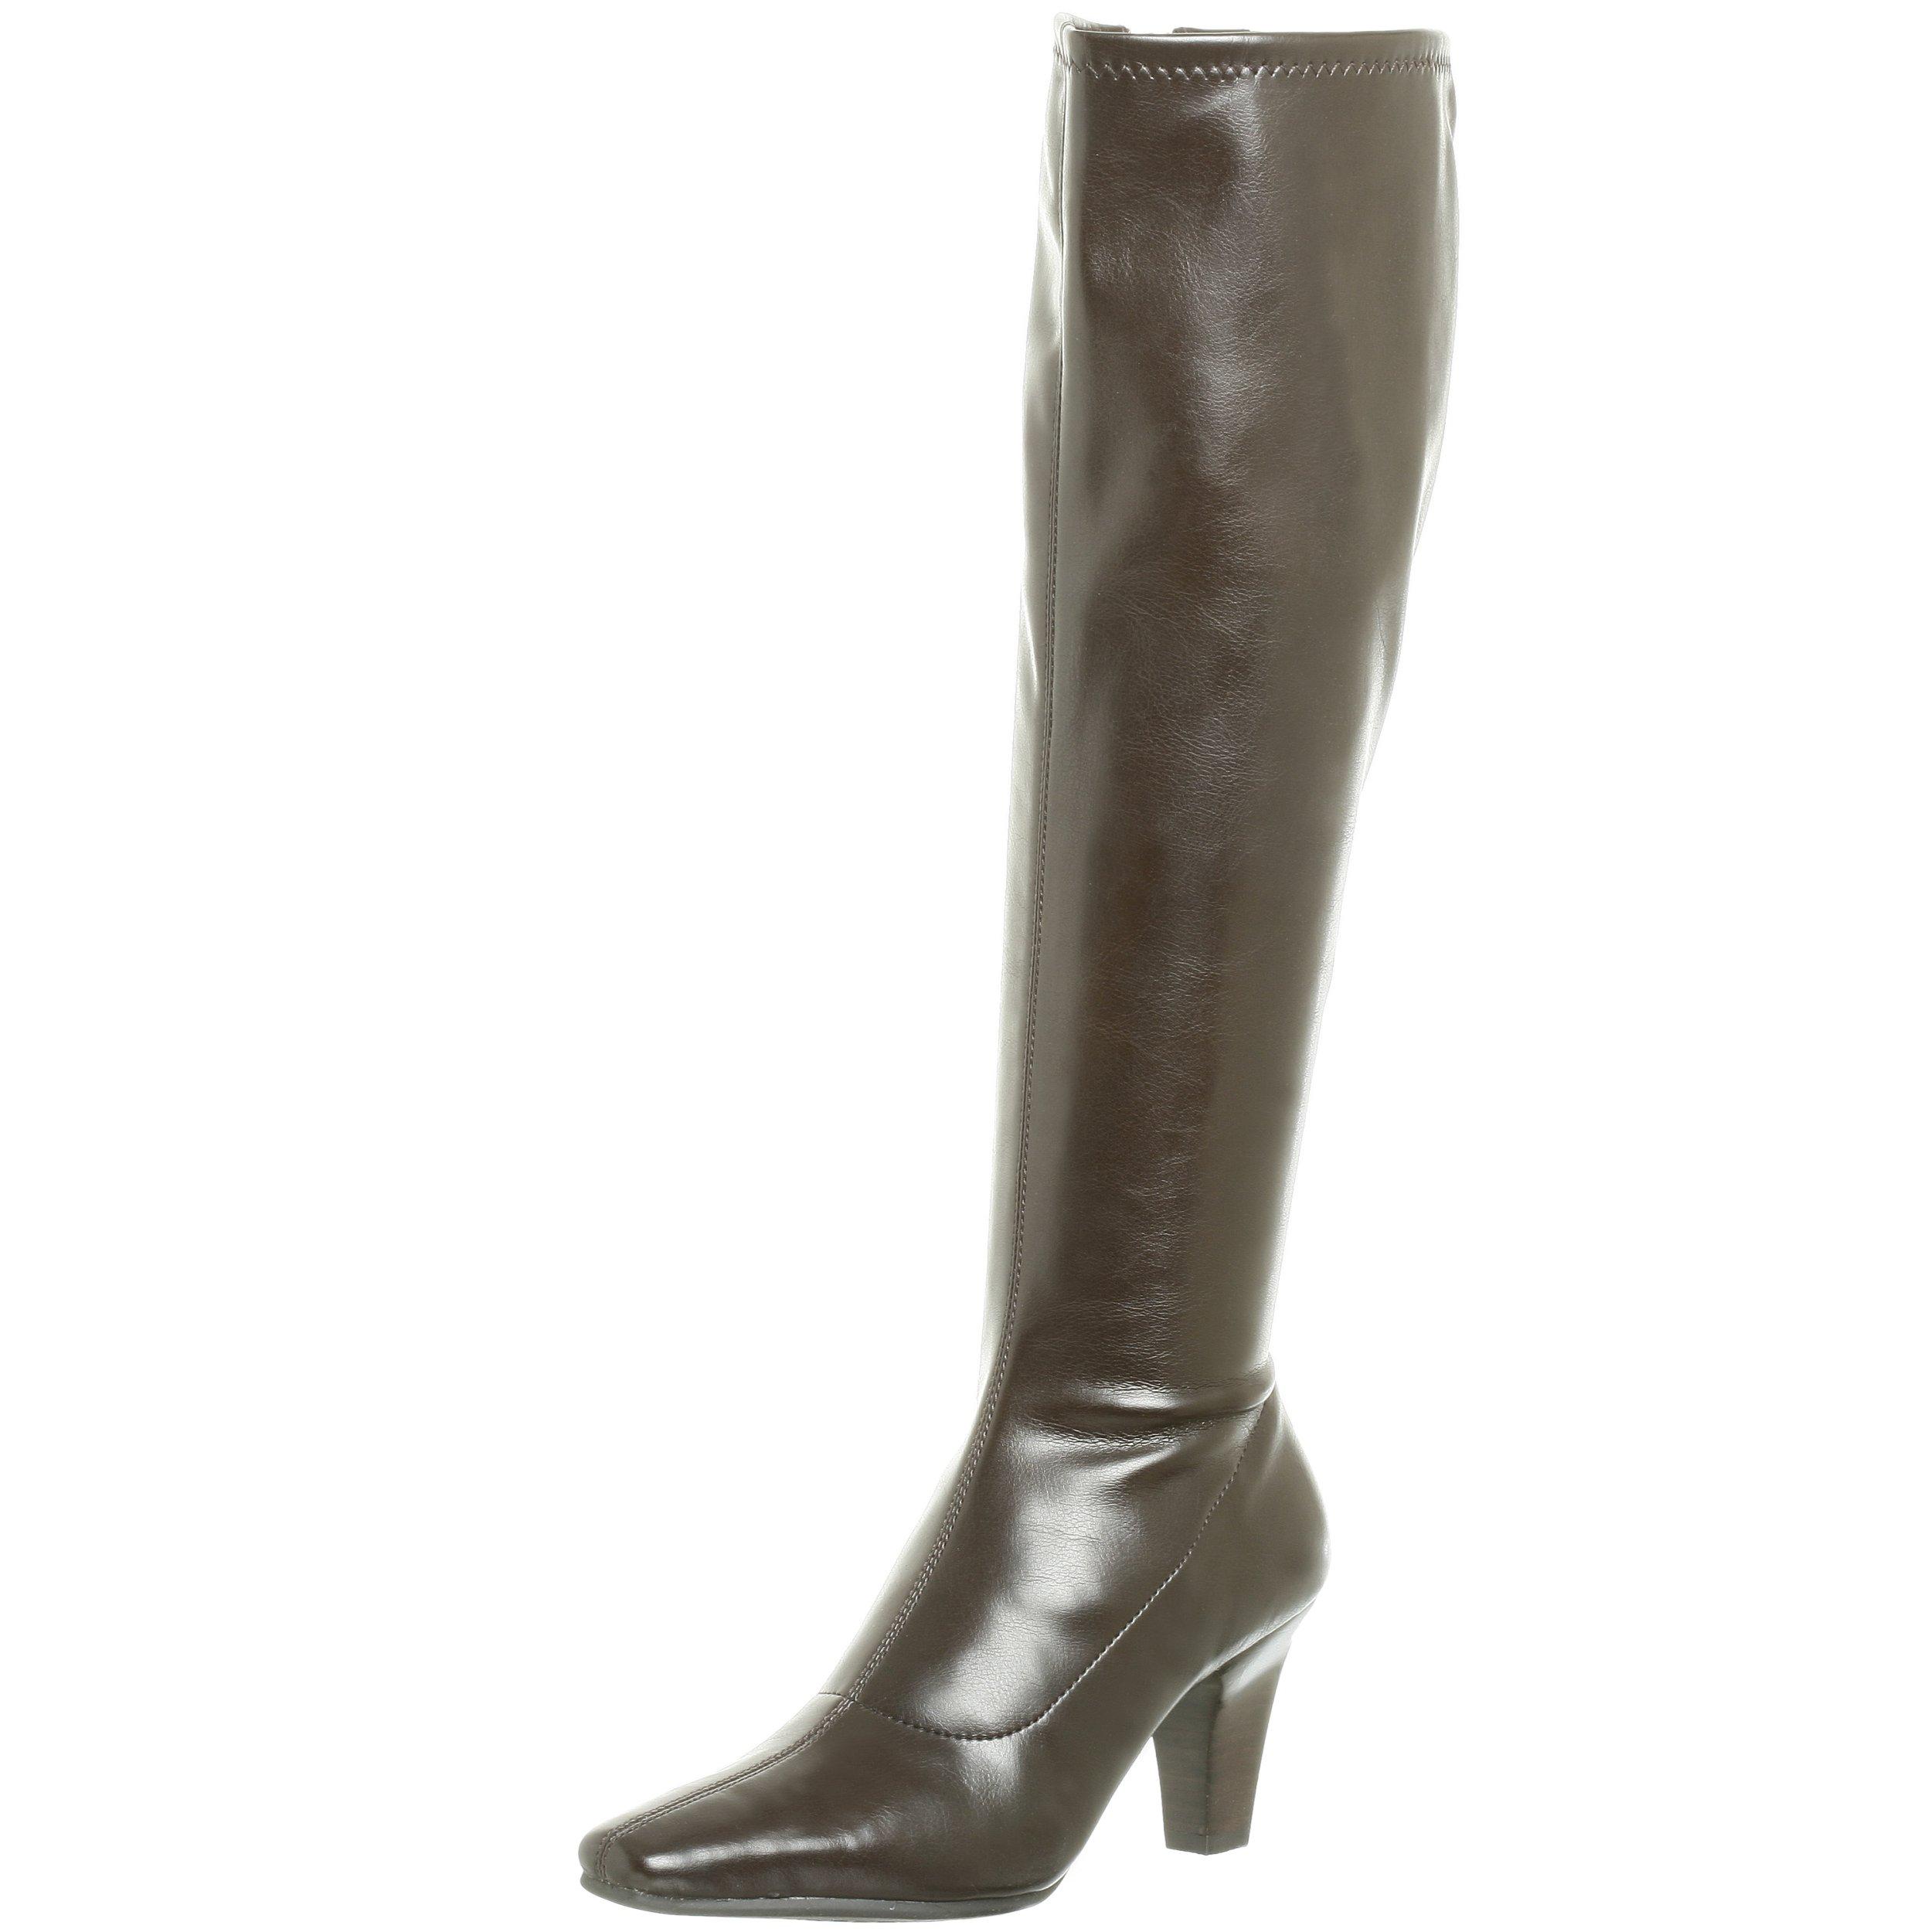 Aerosoles Women's Risky Pizness Boot,Brown Polyurethane,9 W US